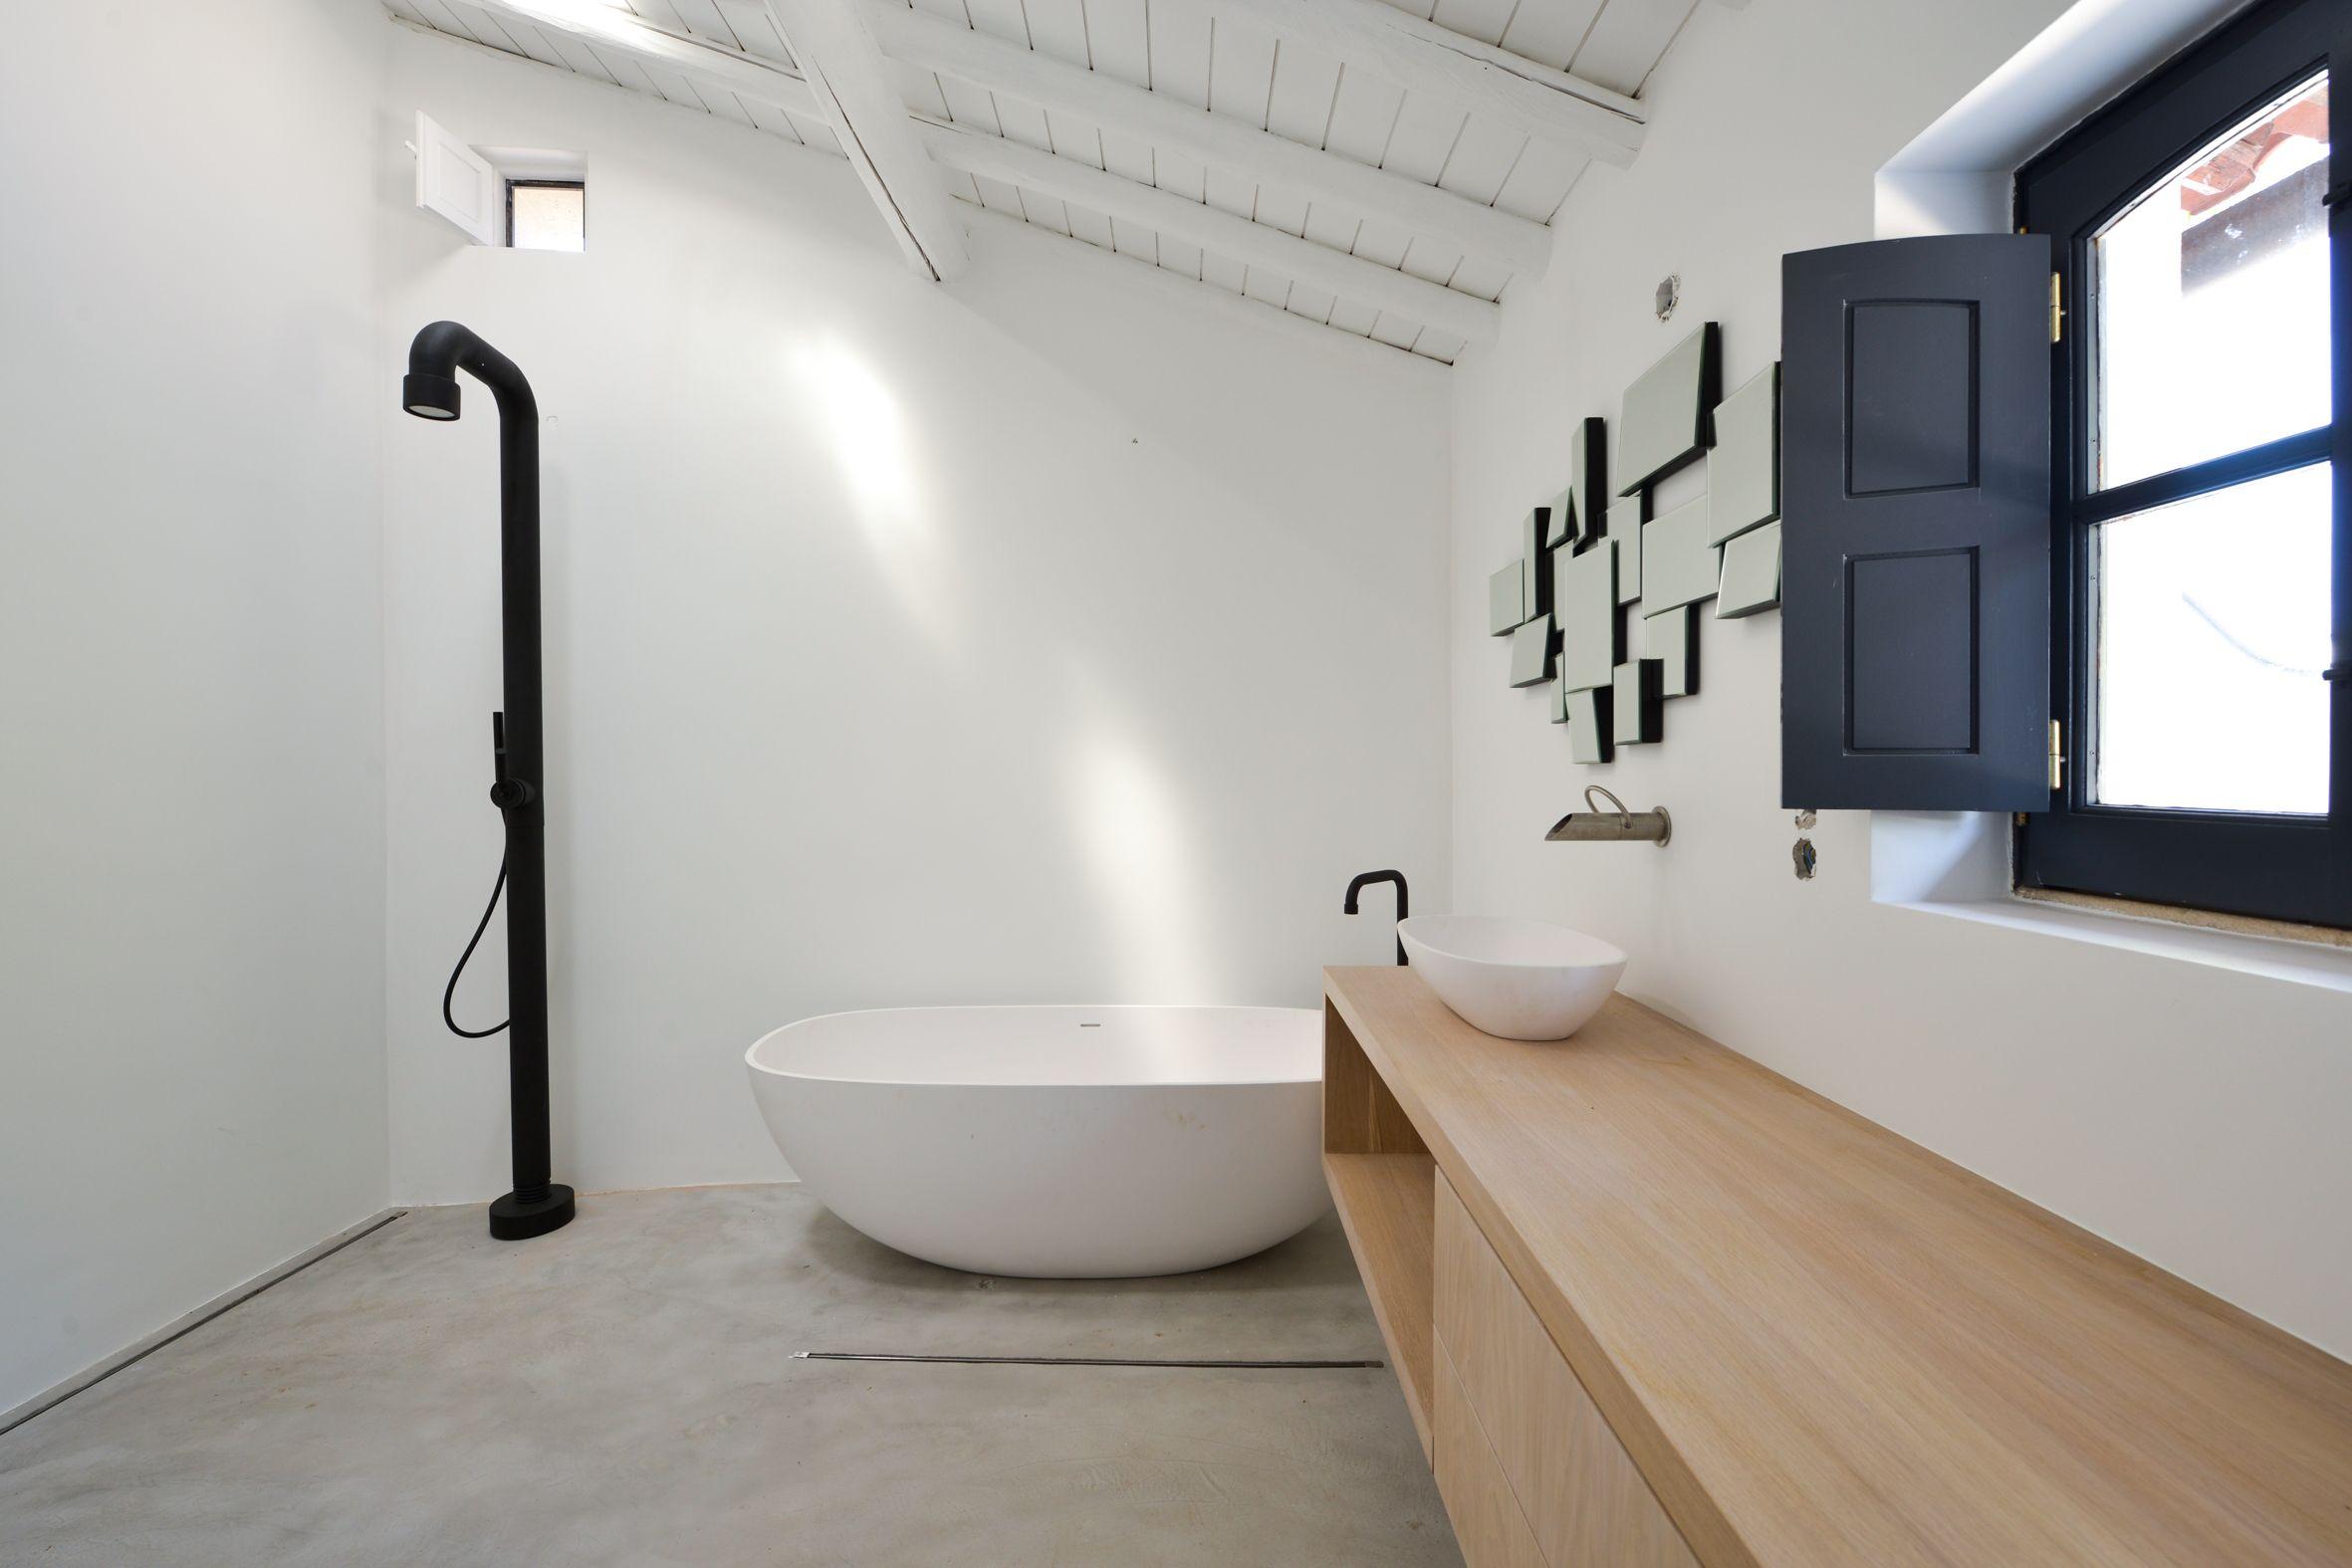 bathroom design by studioarte arnold aarssen, shower -bath ...